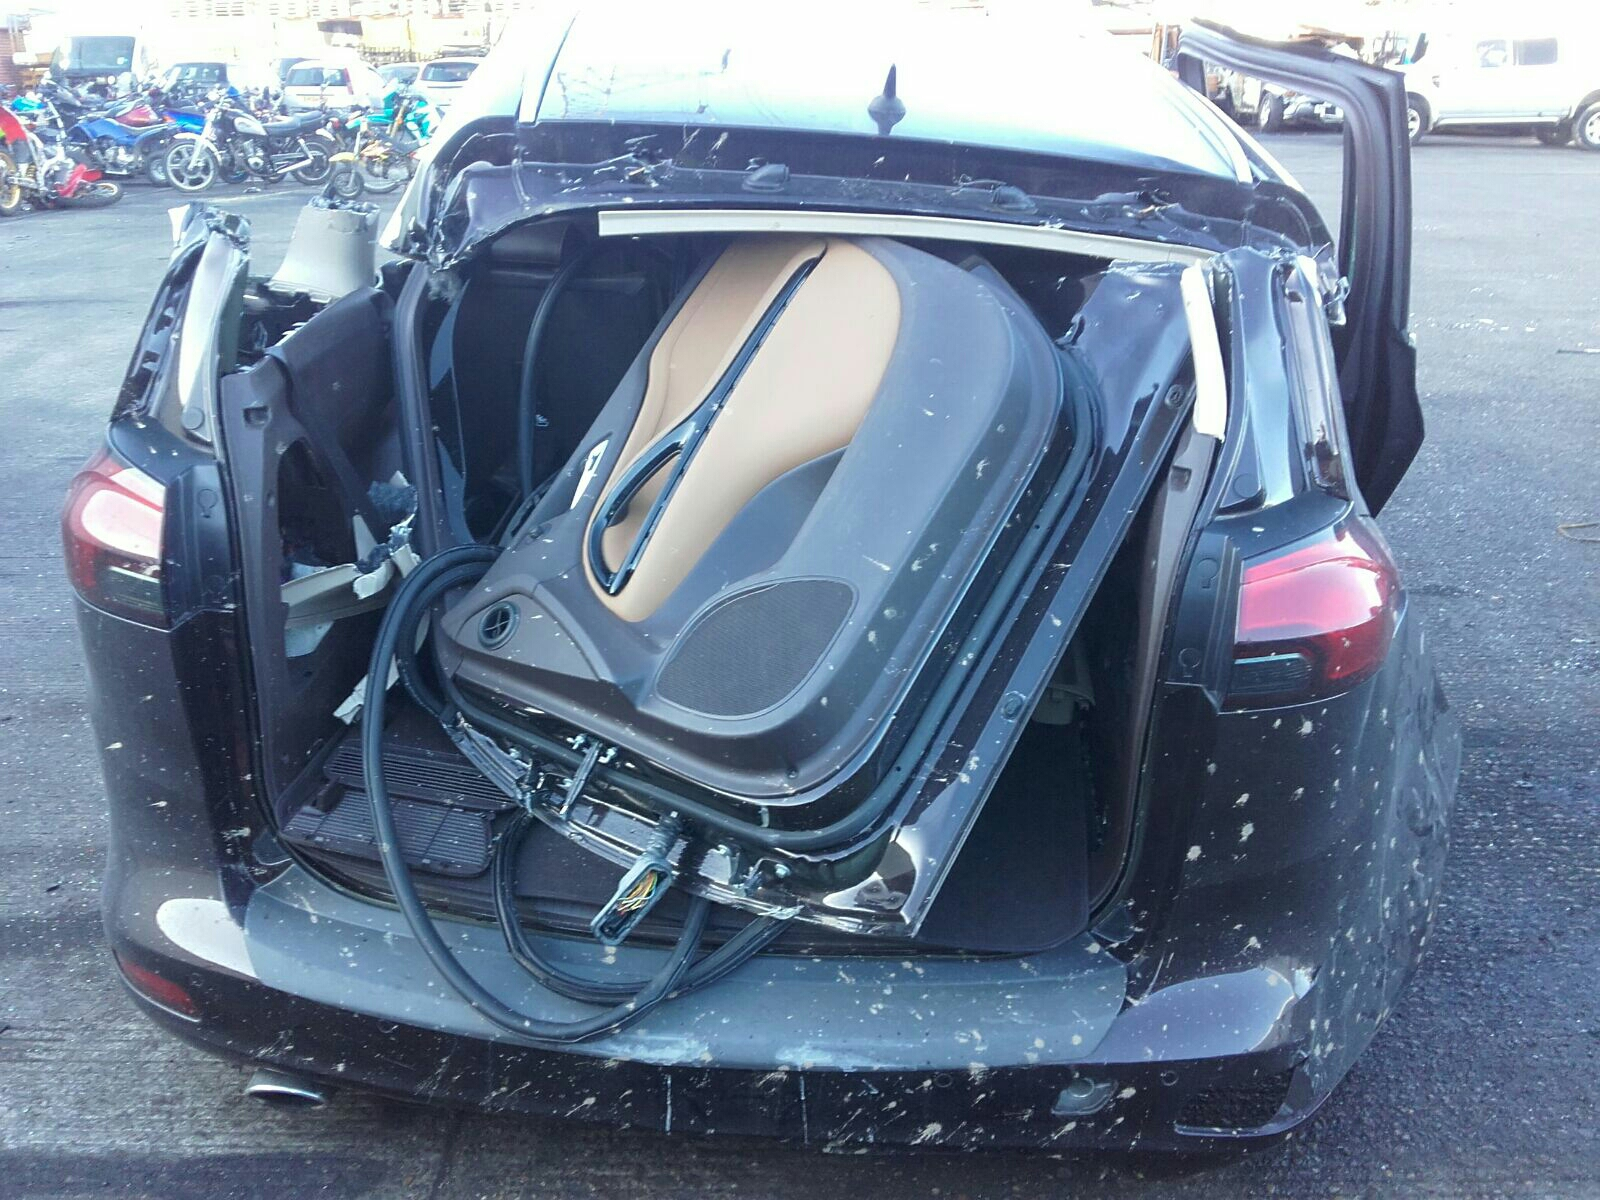 2014 Vauxhall Zafira Tourer 2012 To 2016 Mpv Diesel Automatic Boot